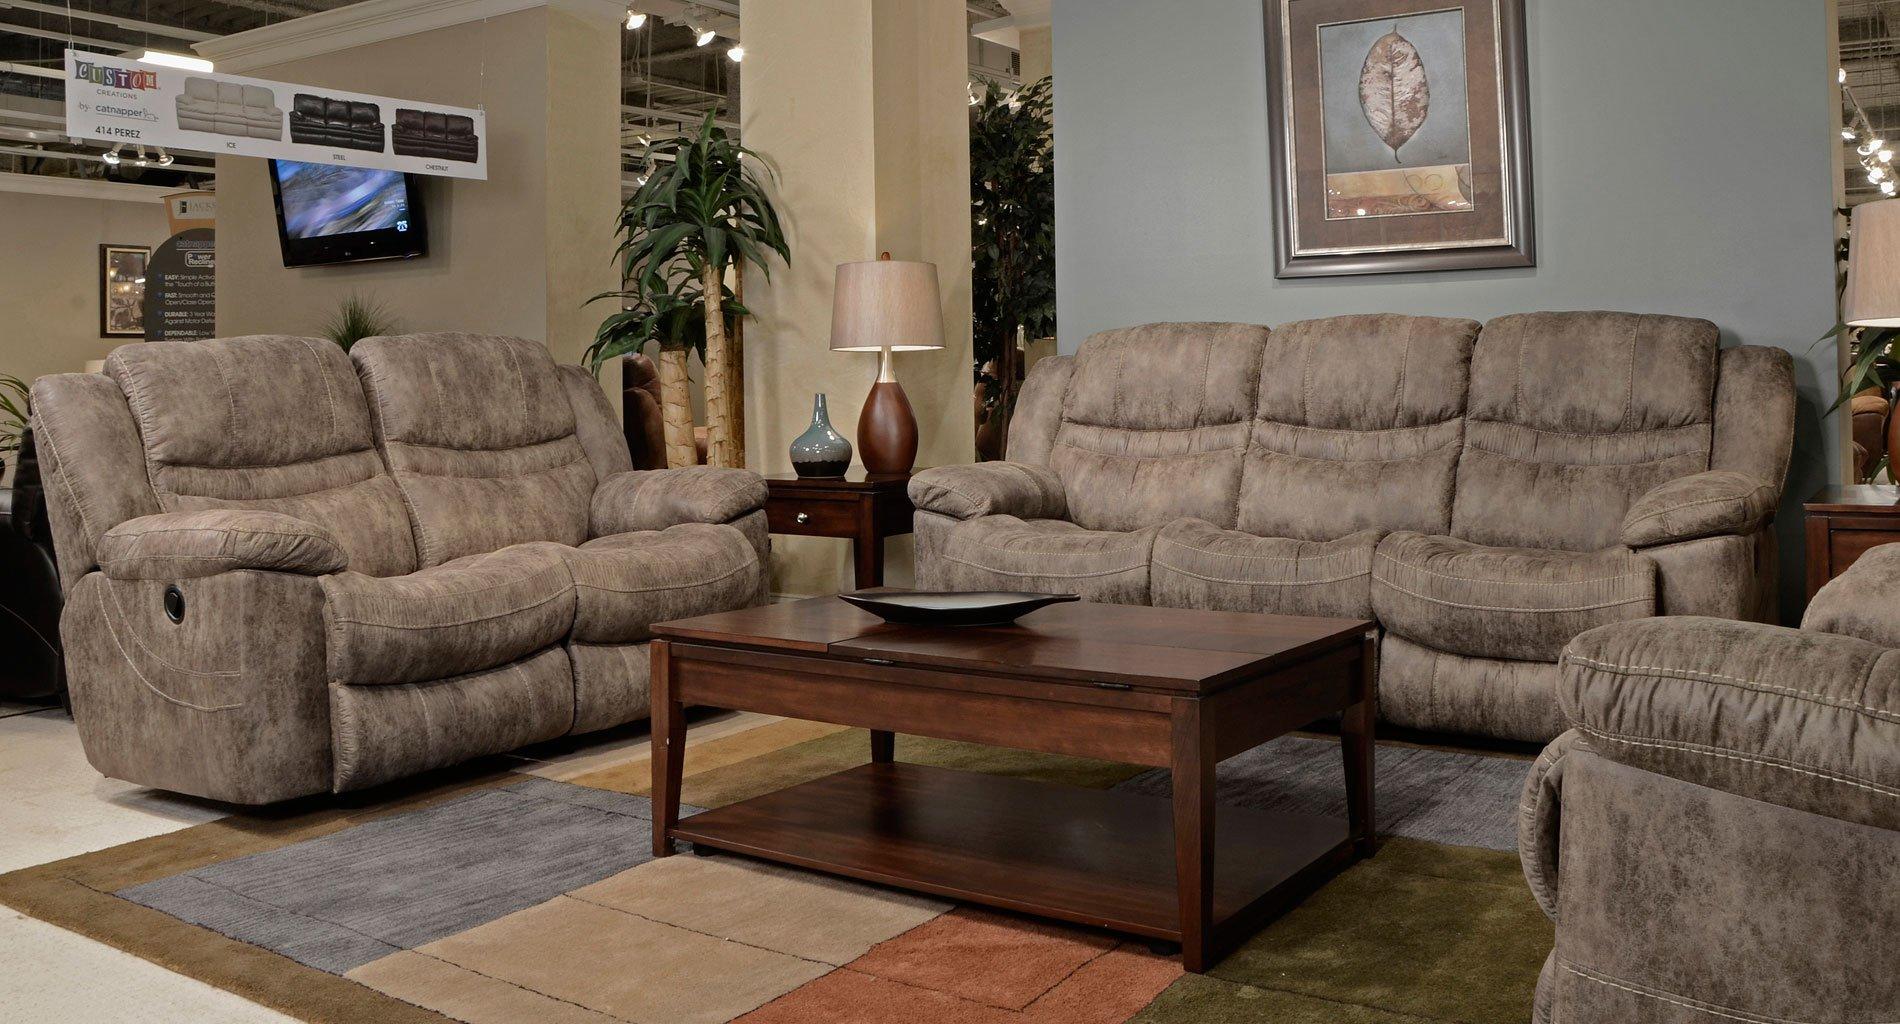 Valiant Reclining Living Room Set Marble Living Room Sets Living Room Furniture Living Room